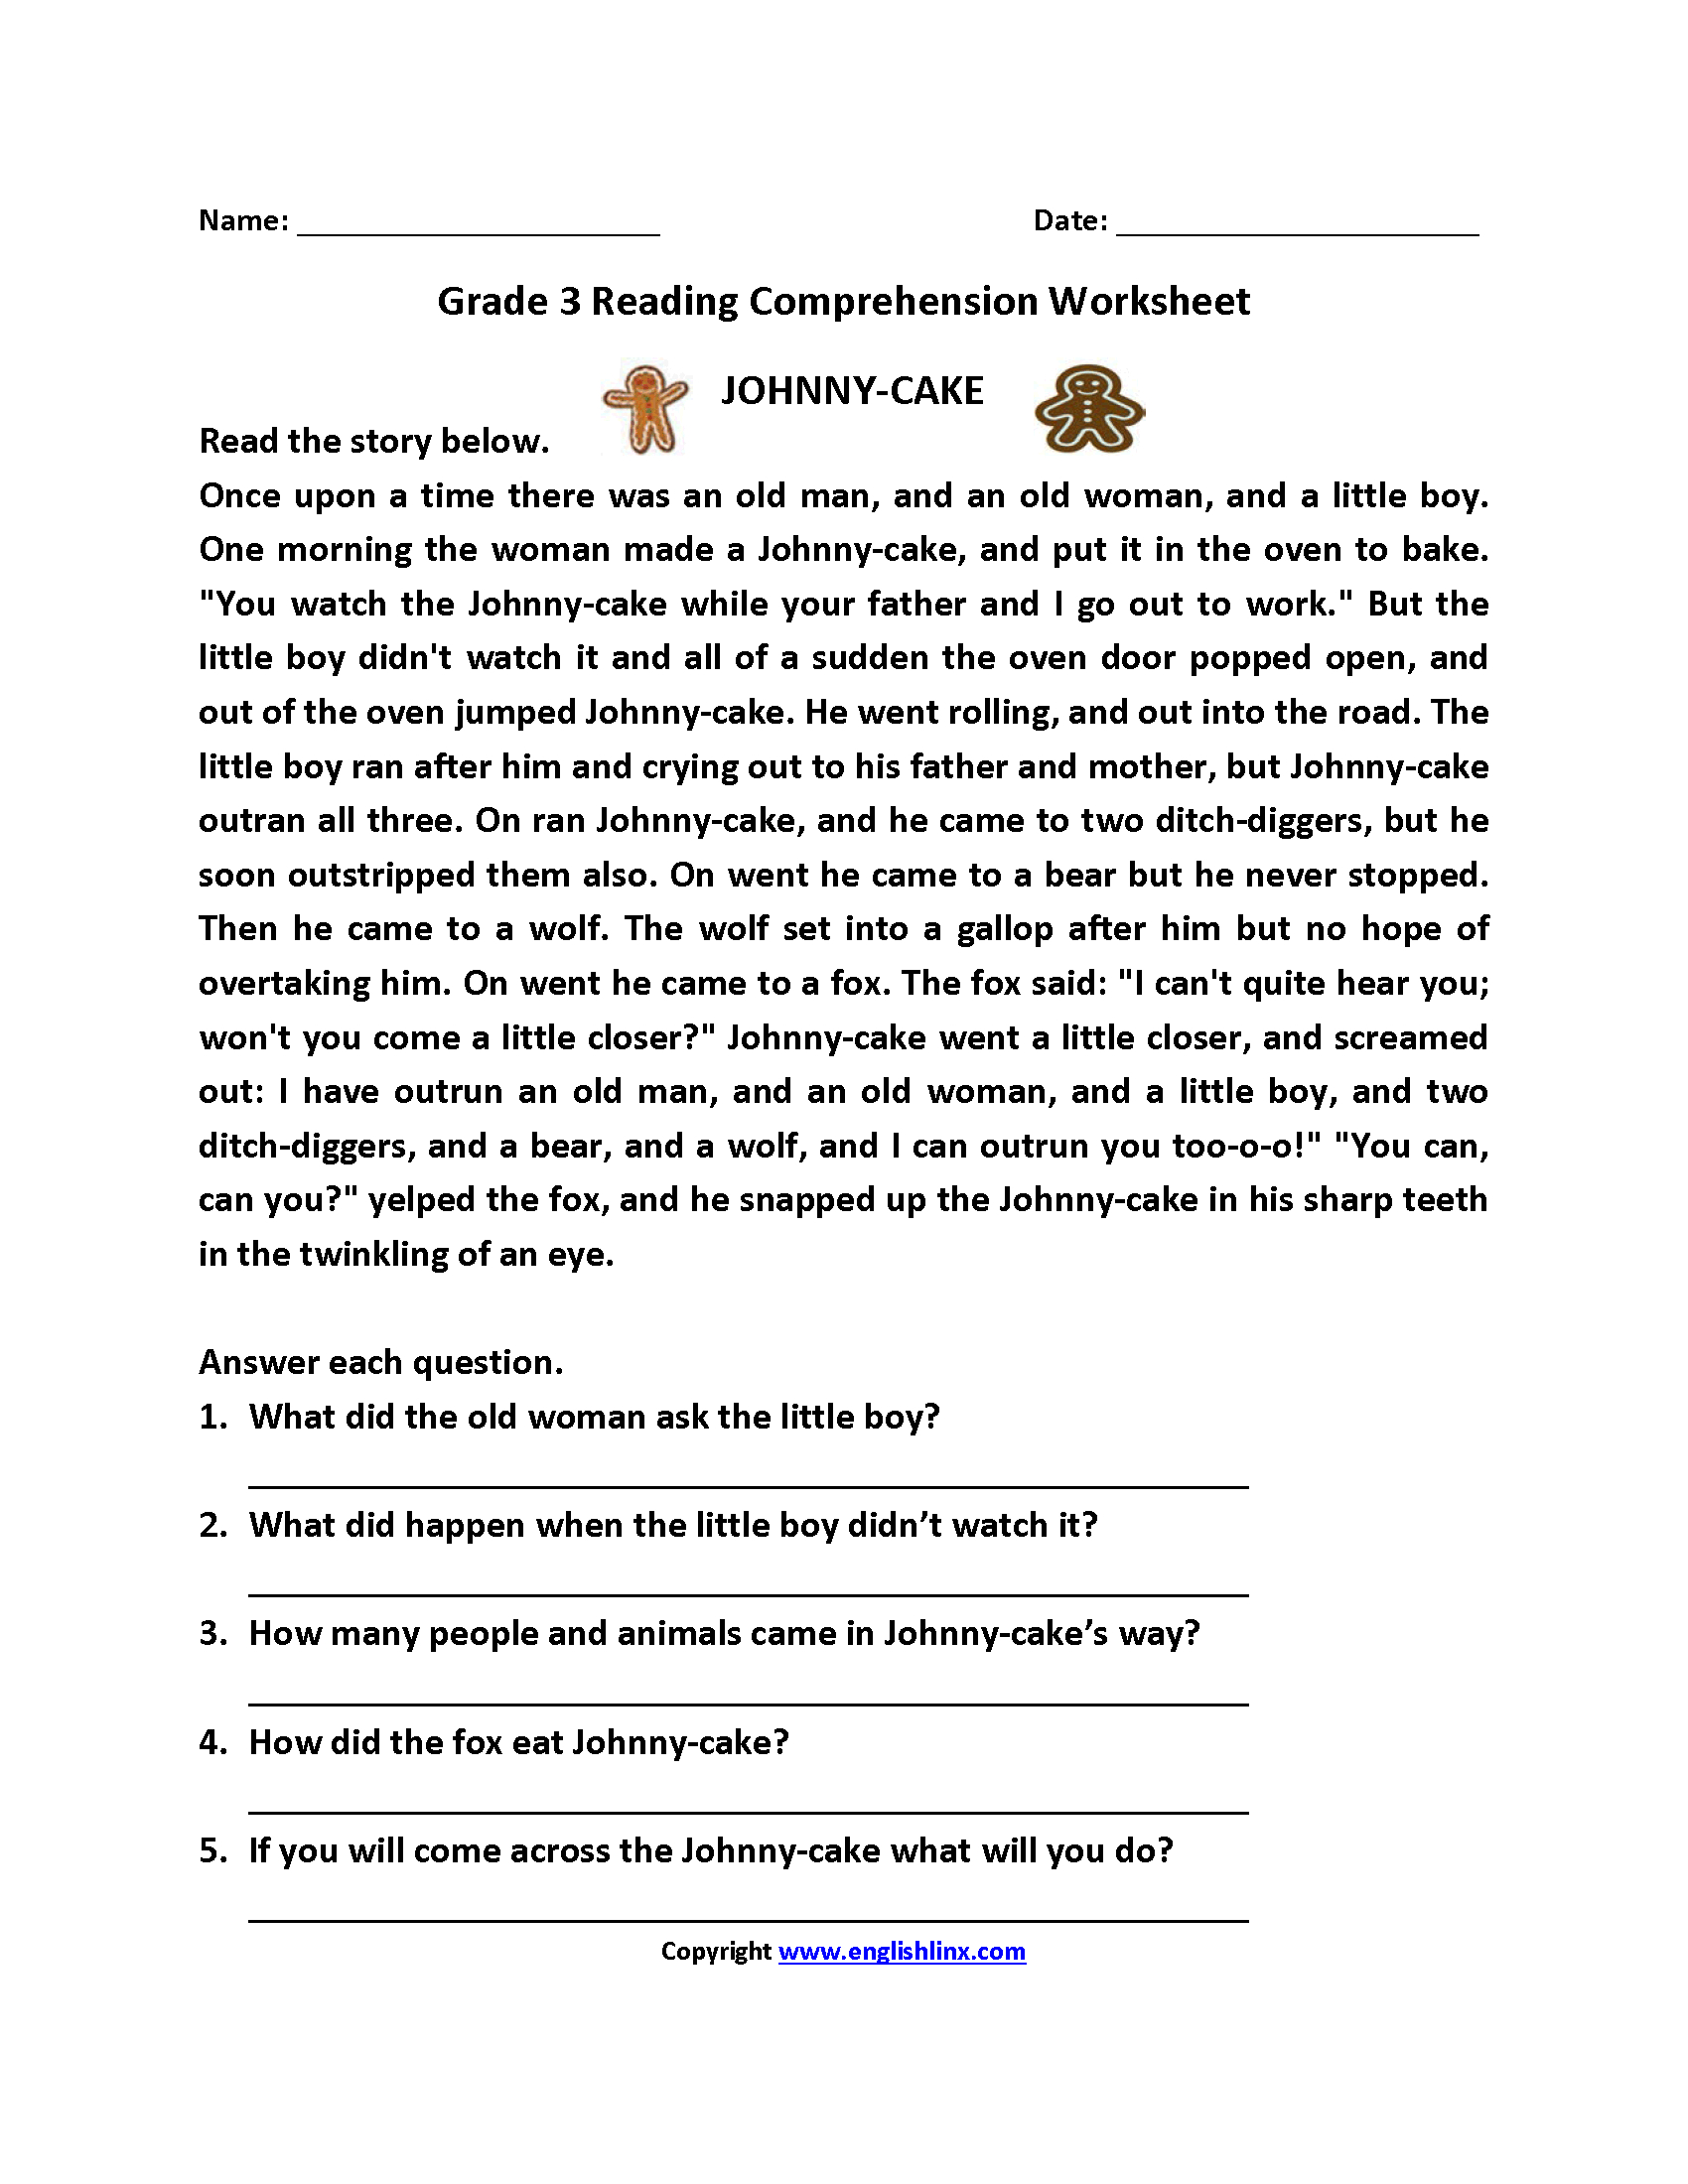 Free Printable Reading Comprehension Worksheets 3rd Grade